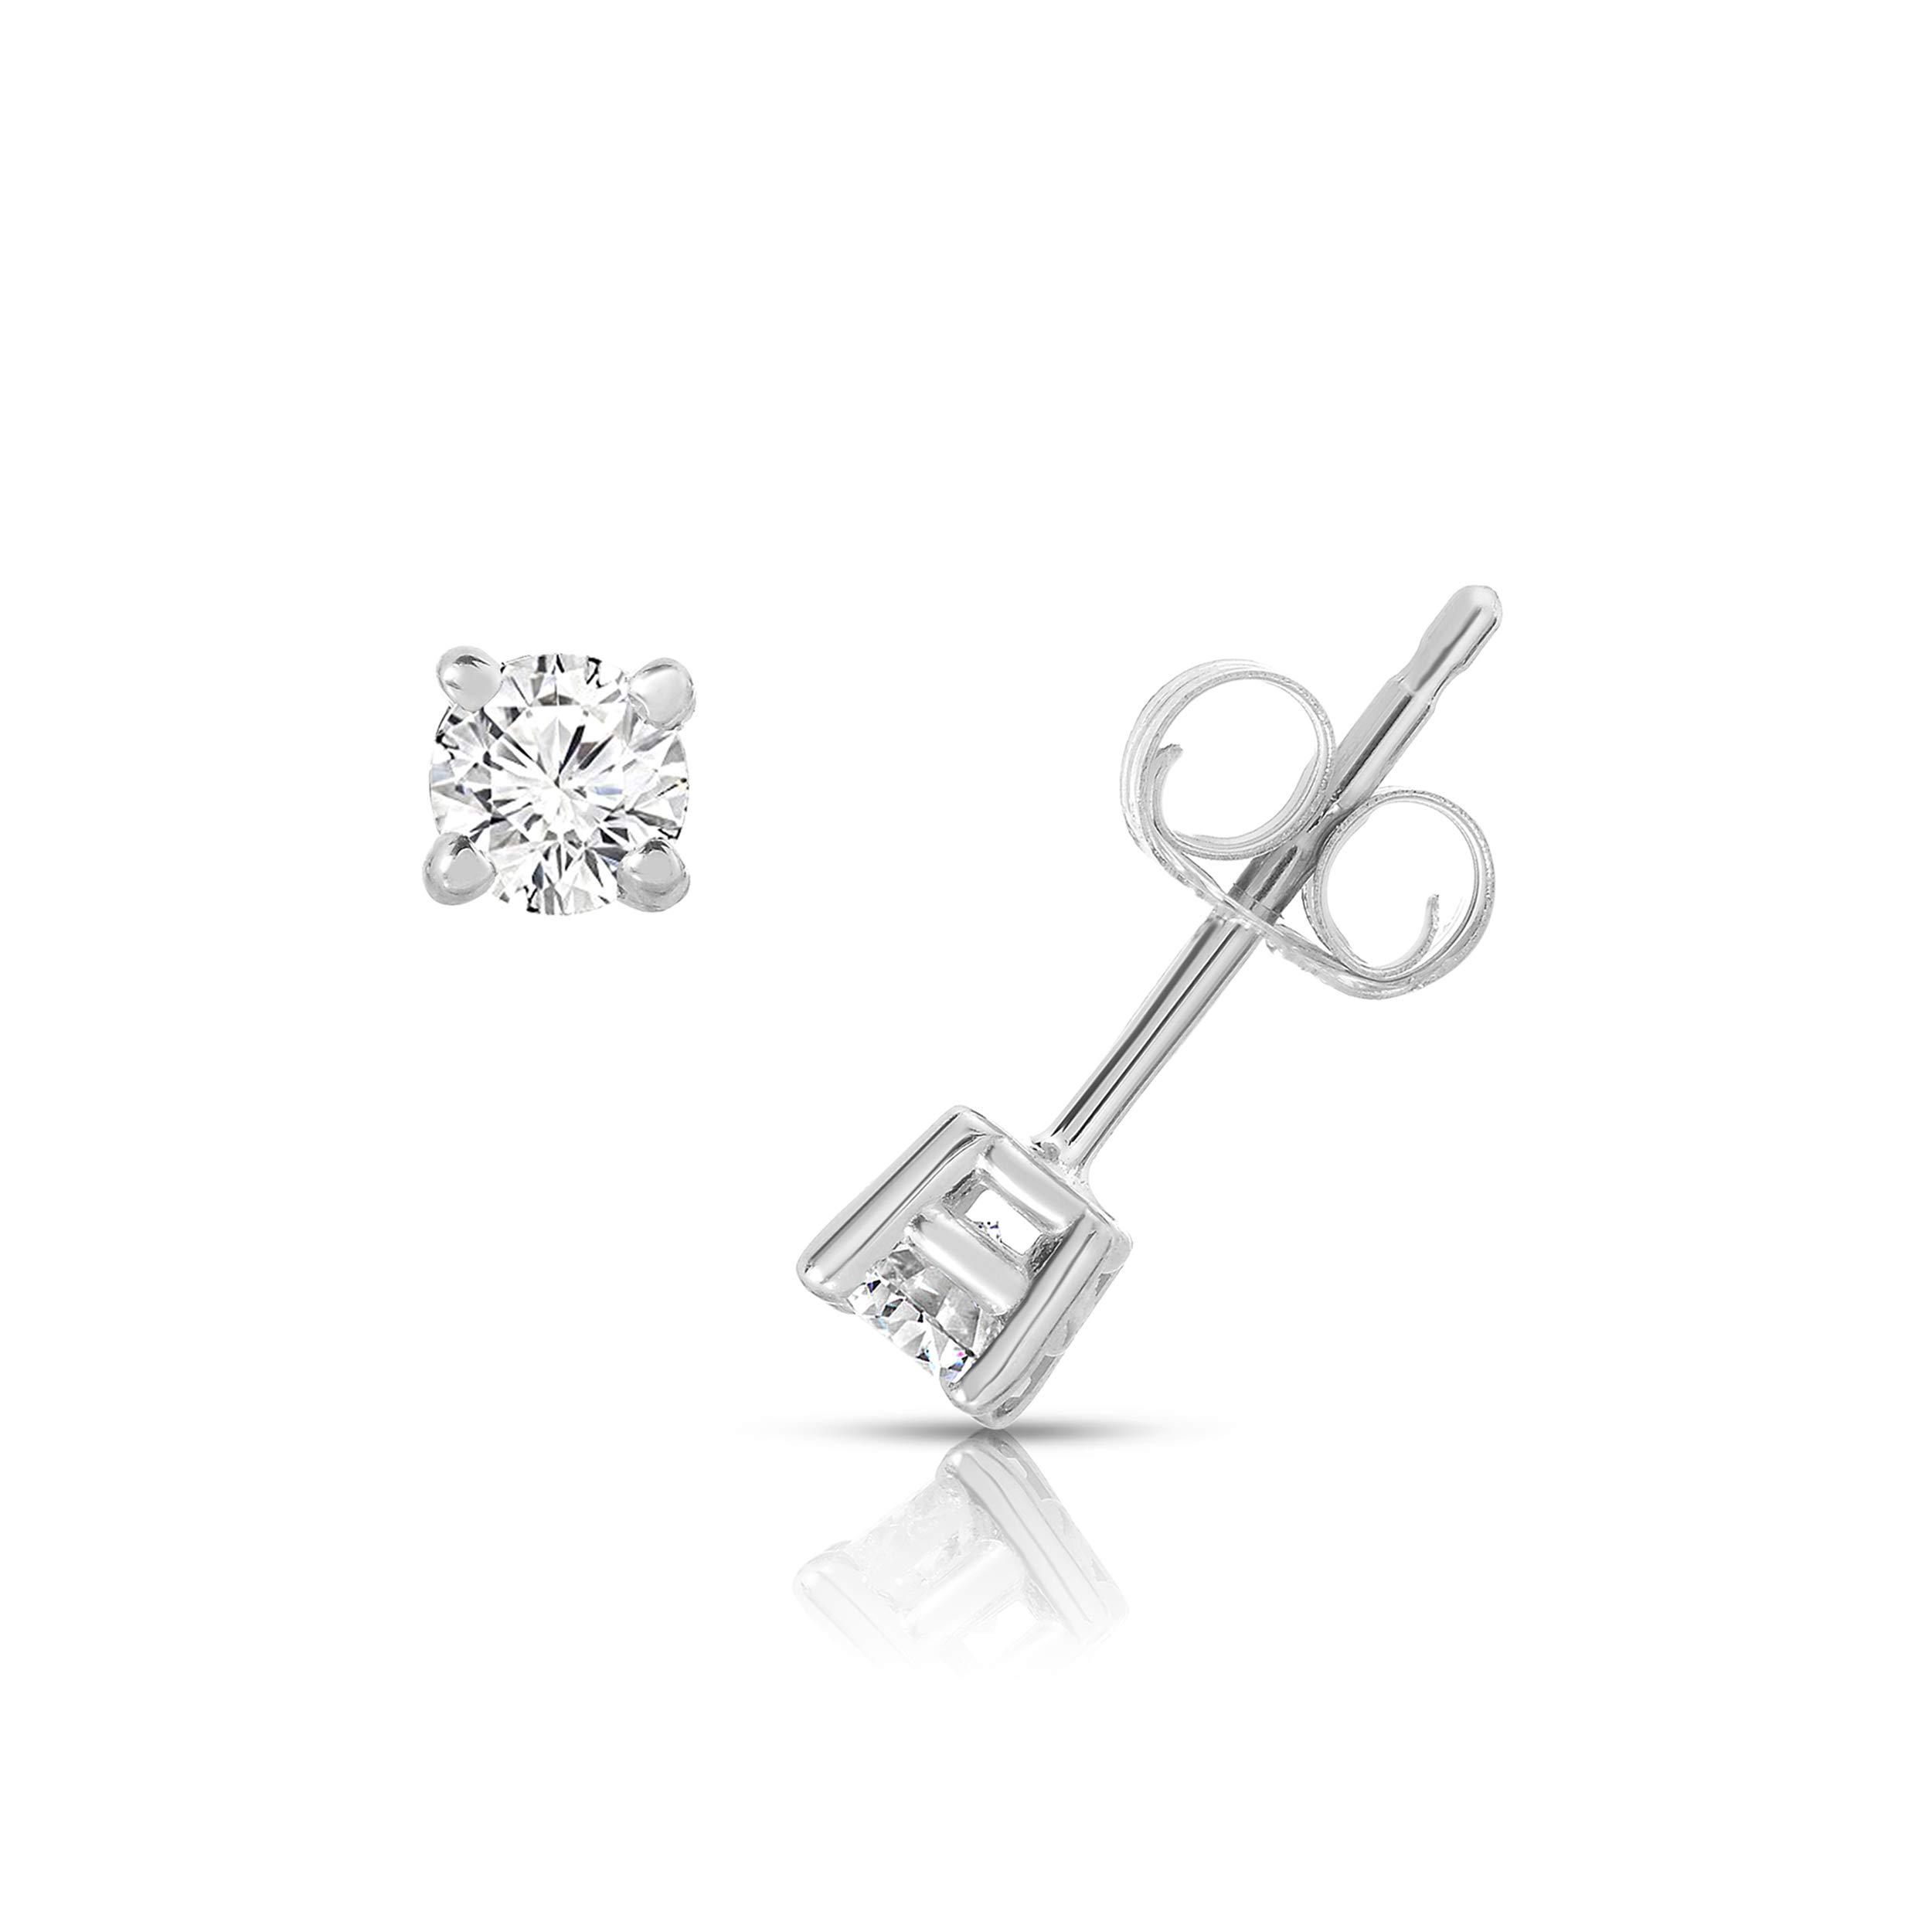 NATALIA DRAKE 10K White Gold Diamond Round Solitaire 4 Prong Stud Earrings (0.25CTW)